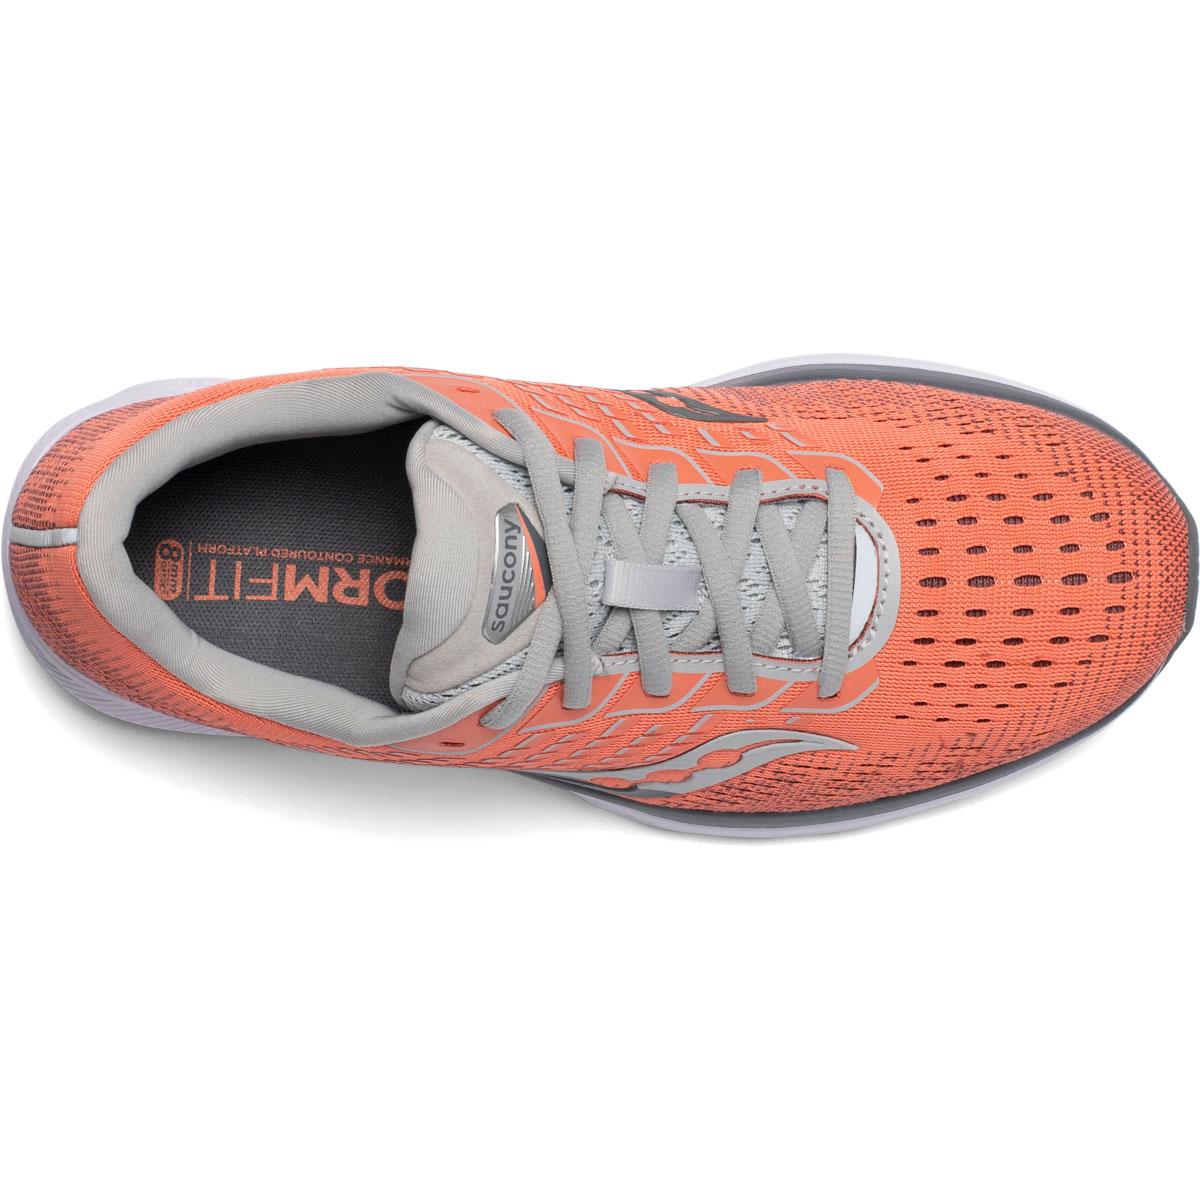 Women's Saucony Ride 13 Running Shoe, , large, image 3